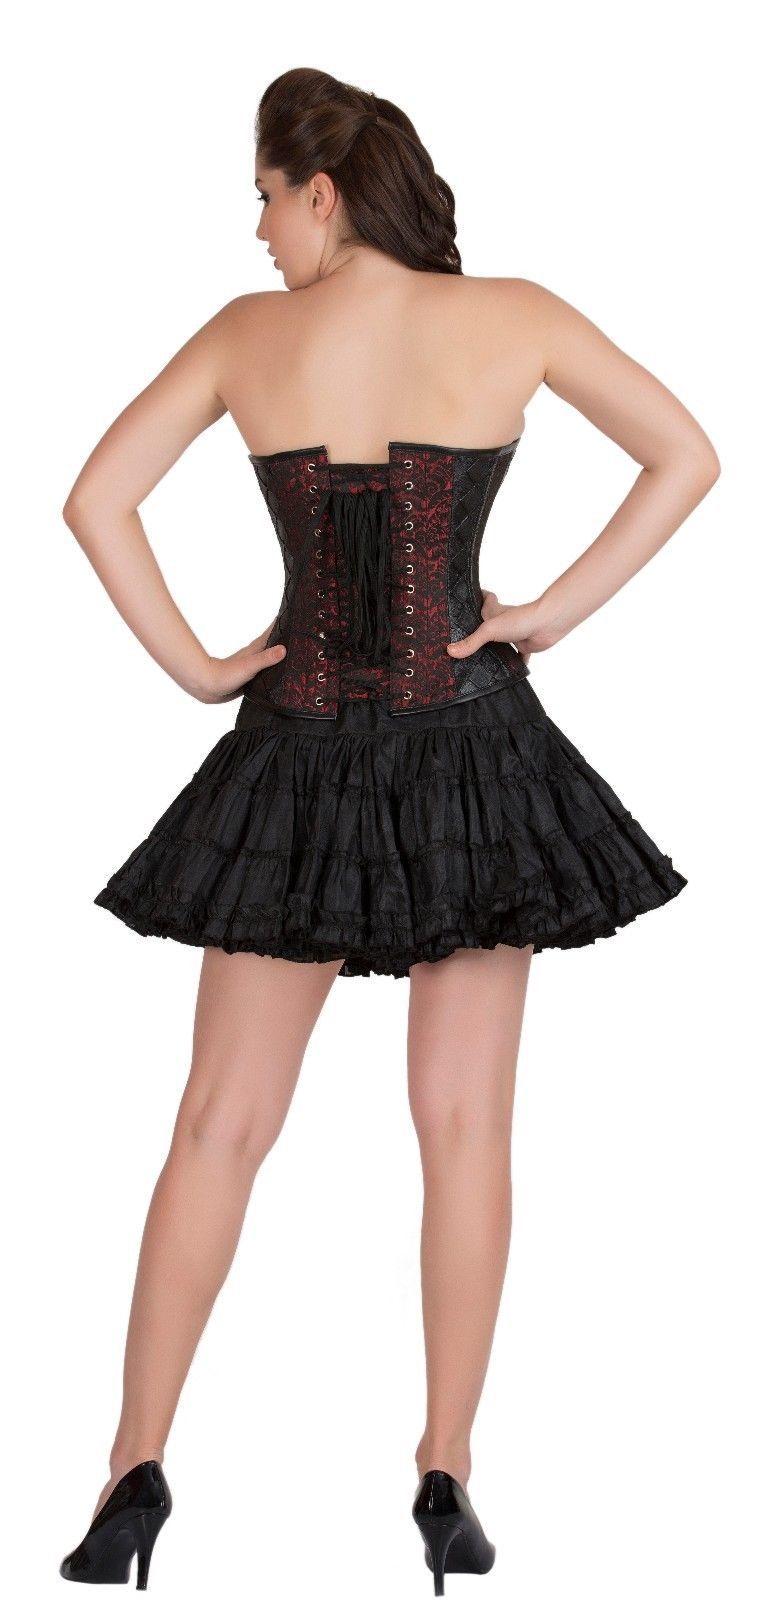 Red Black Brocade & Leather Goth Halloween Costume Burlesque Overbust Corset Top